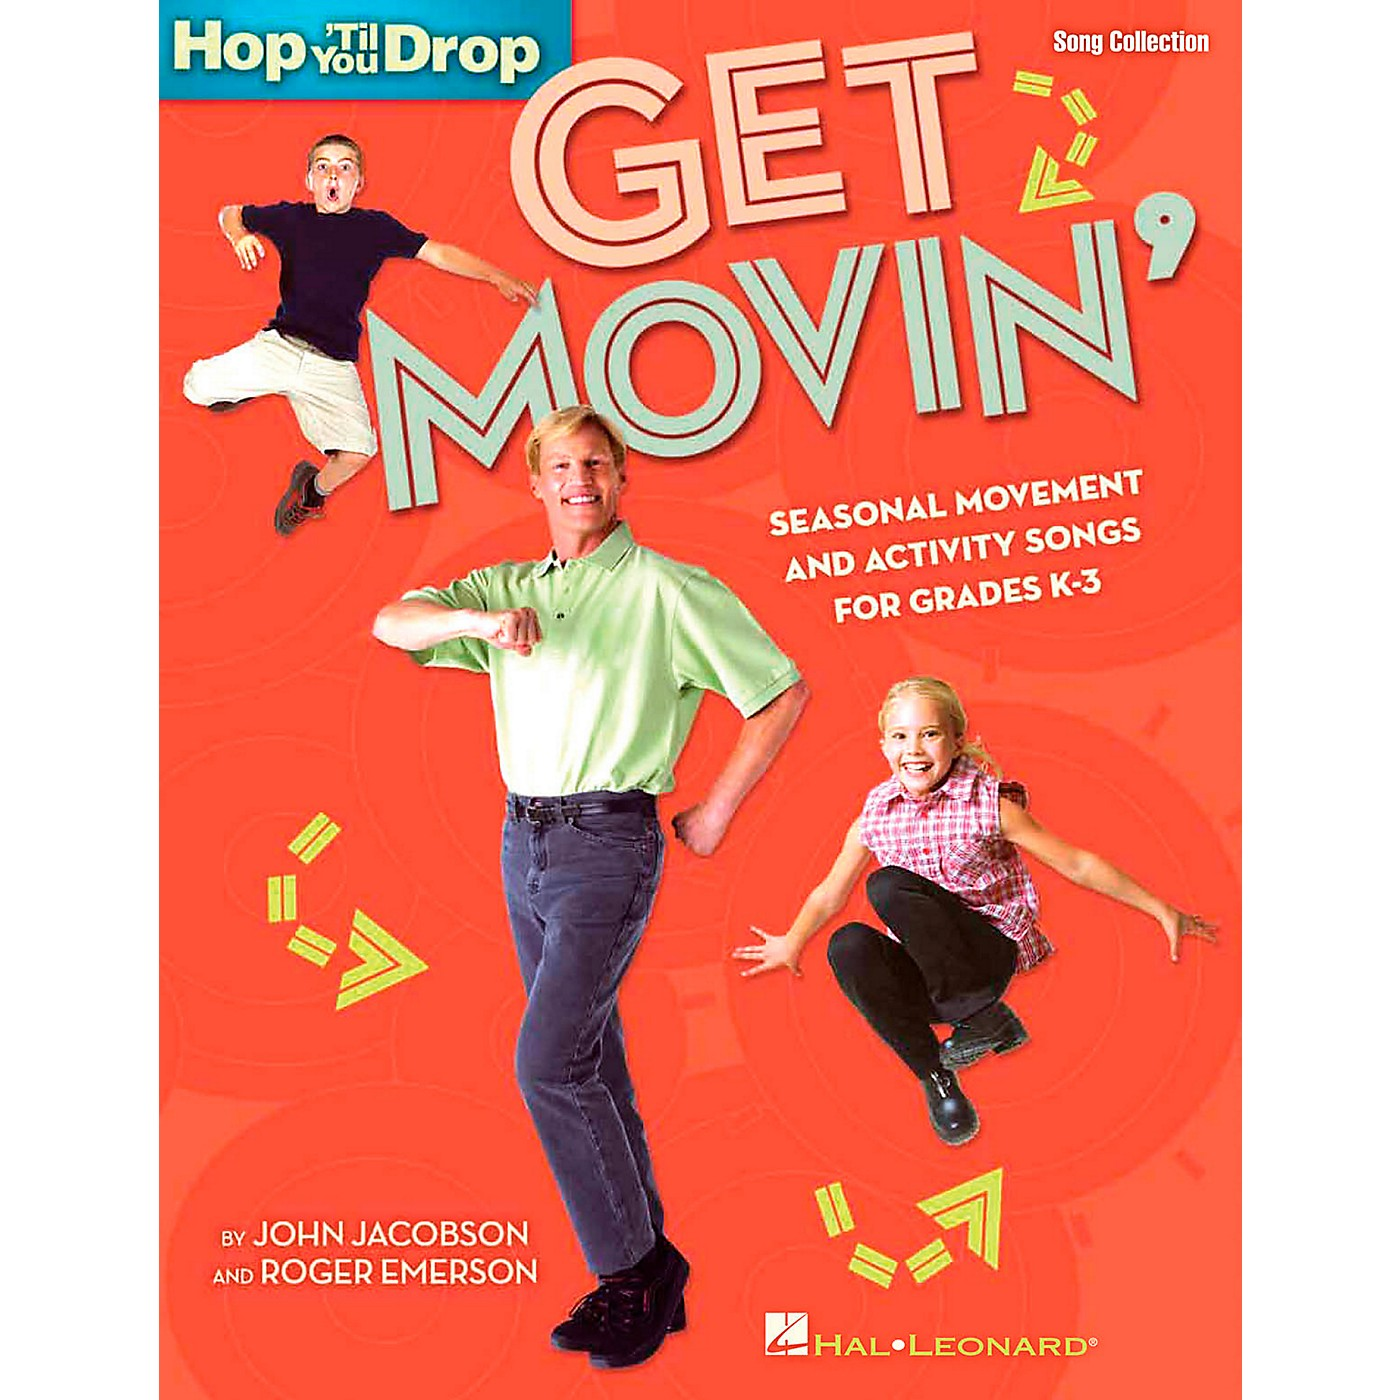 Hal Leonard Get Movin' Seasonal Movement and Activity Songs for Grades K-3 thumbnail